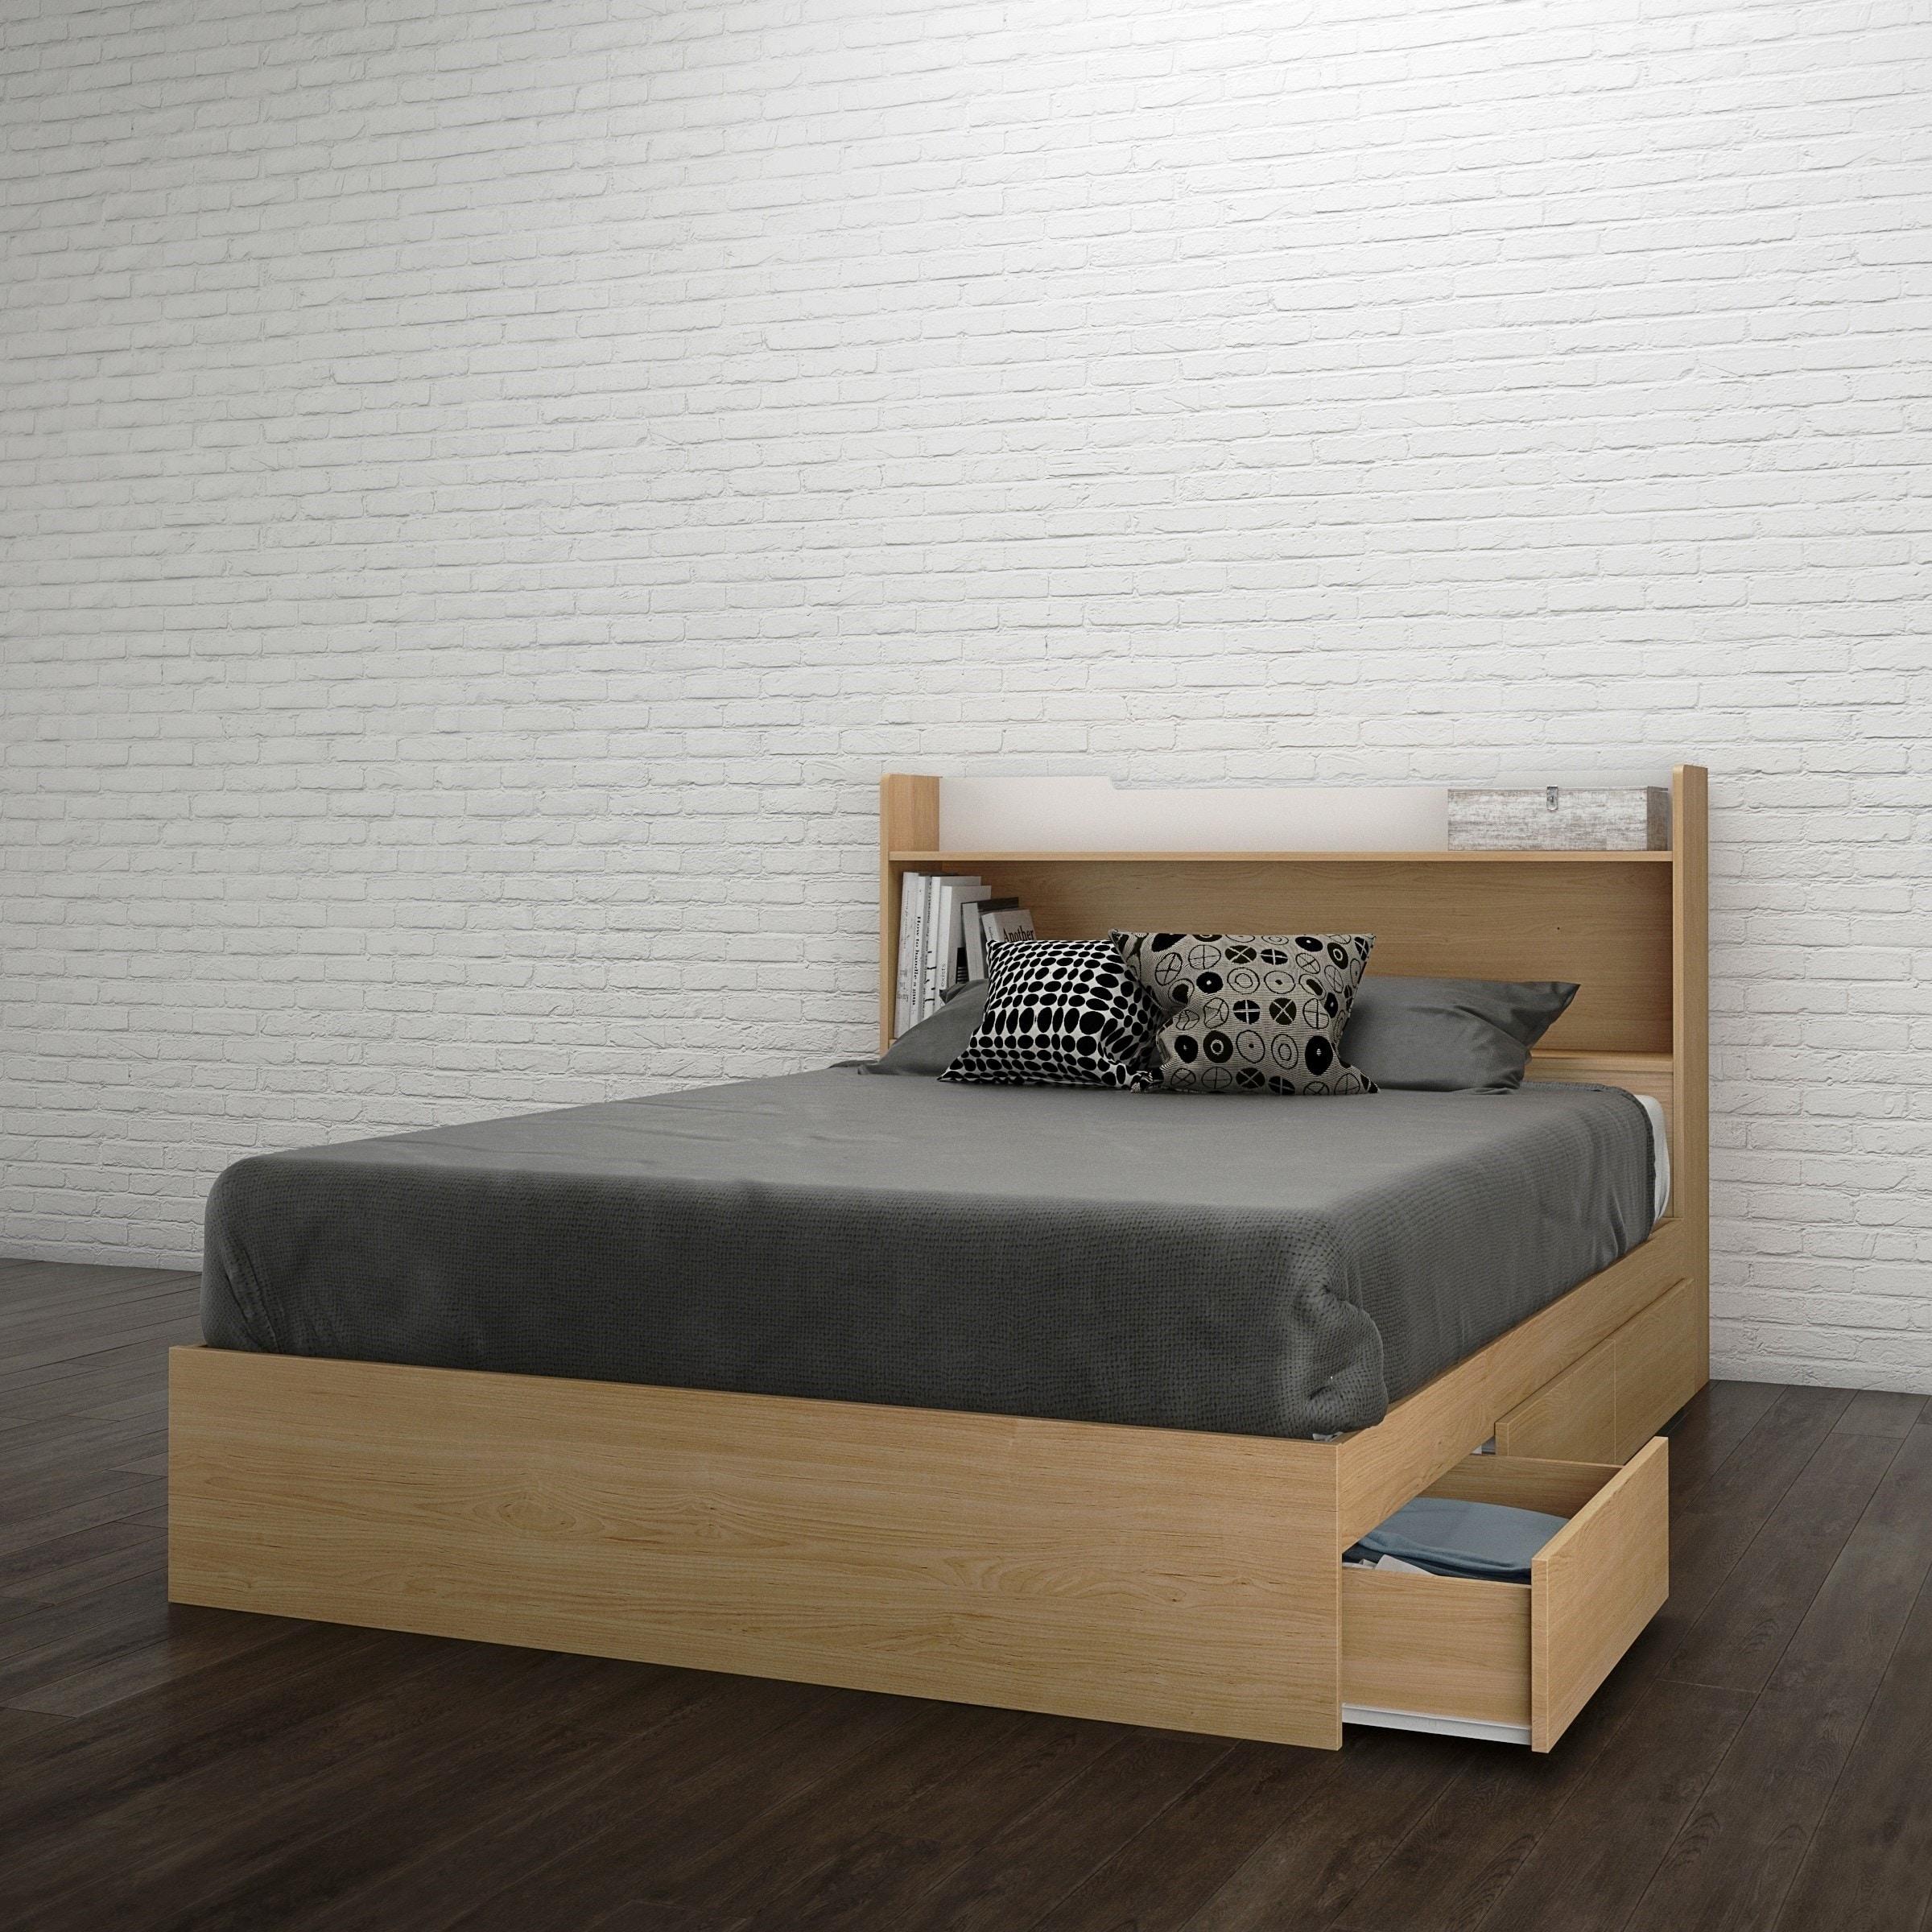 Nexera Nordik Storage Bed With Headboard Natural Maple And White